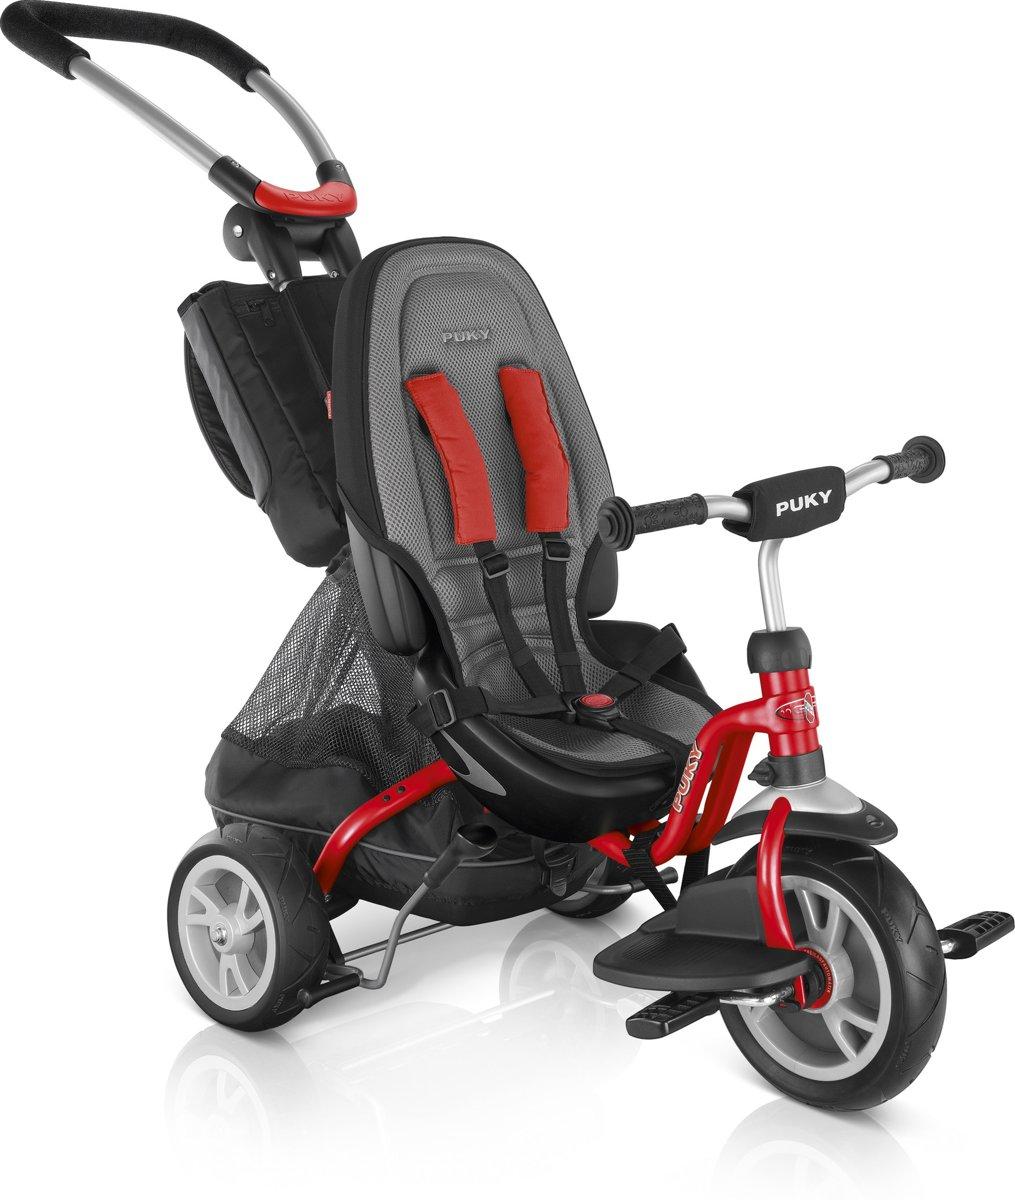 Driewieler Puky Ceety Premium rood 18 mnd/80 cm